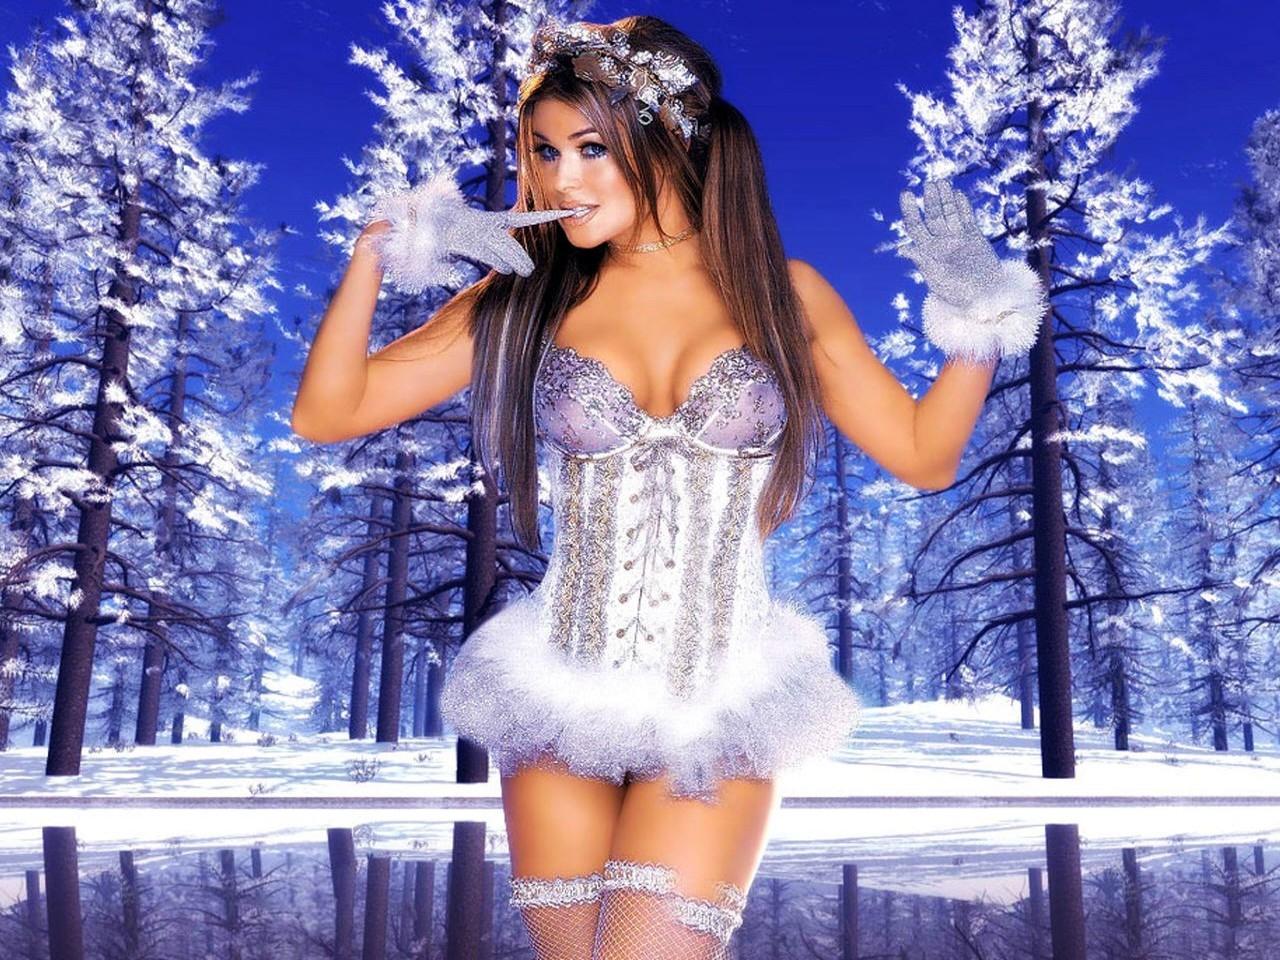 Wallpaper di Carmen Electra in lingerie 'natalizia'